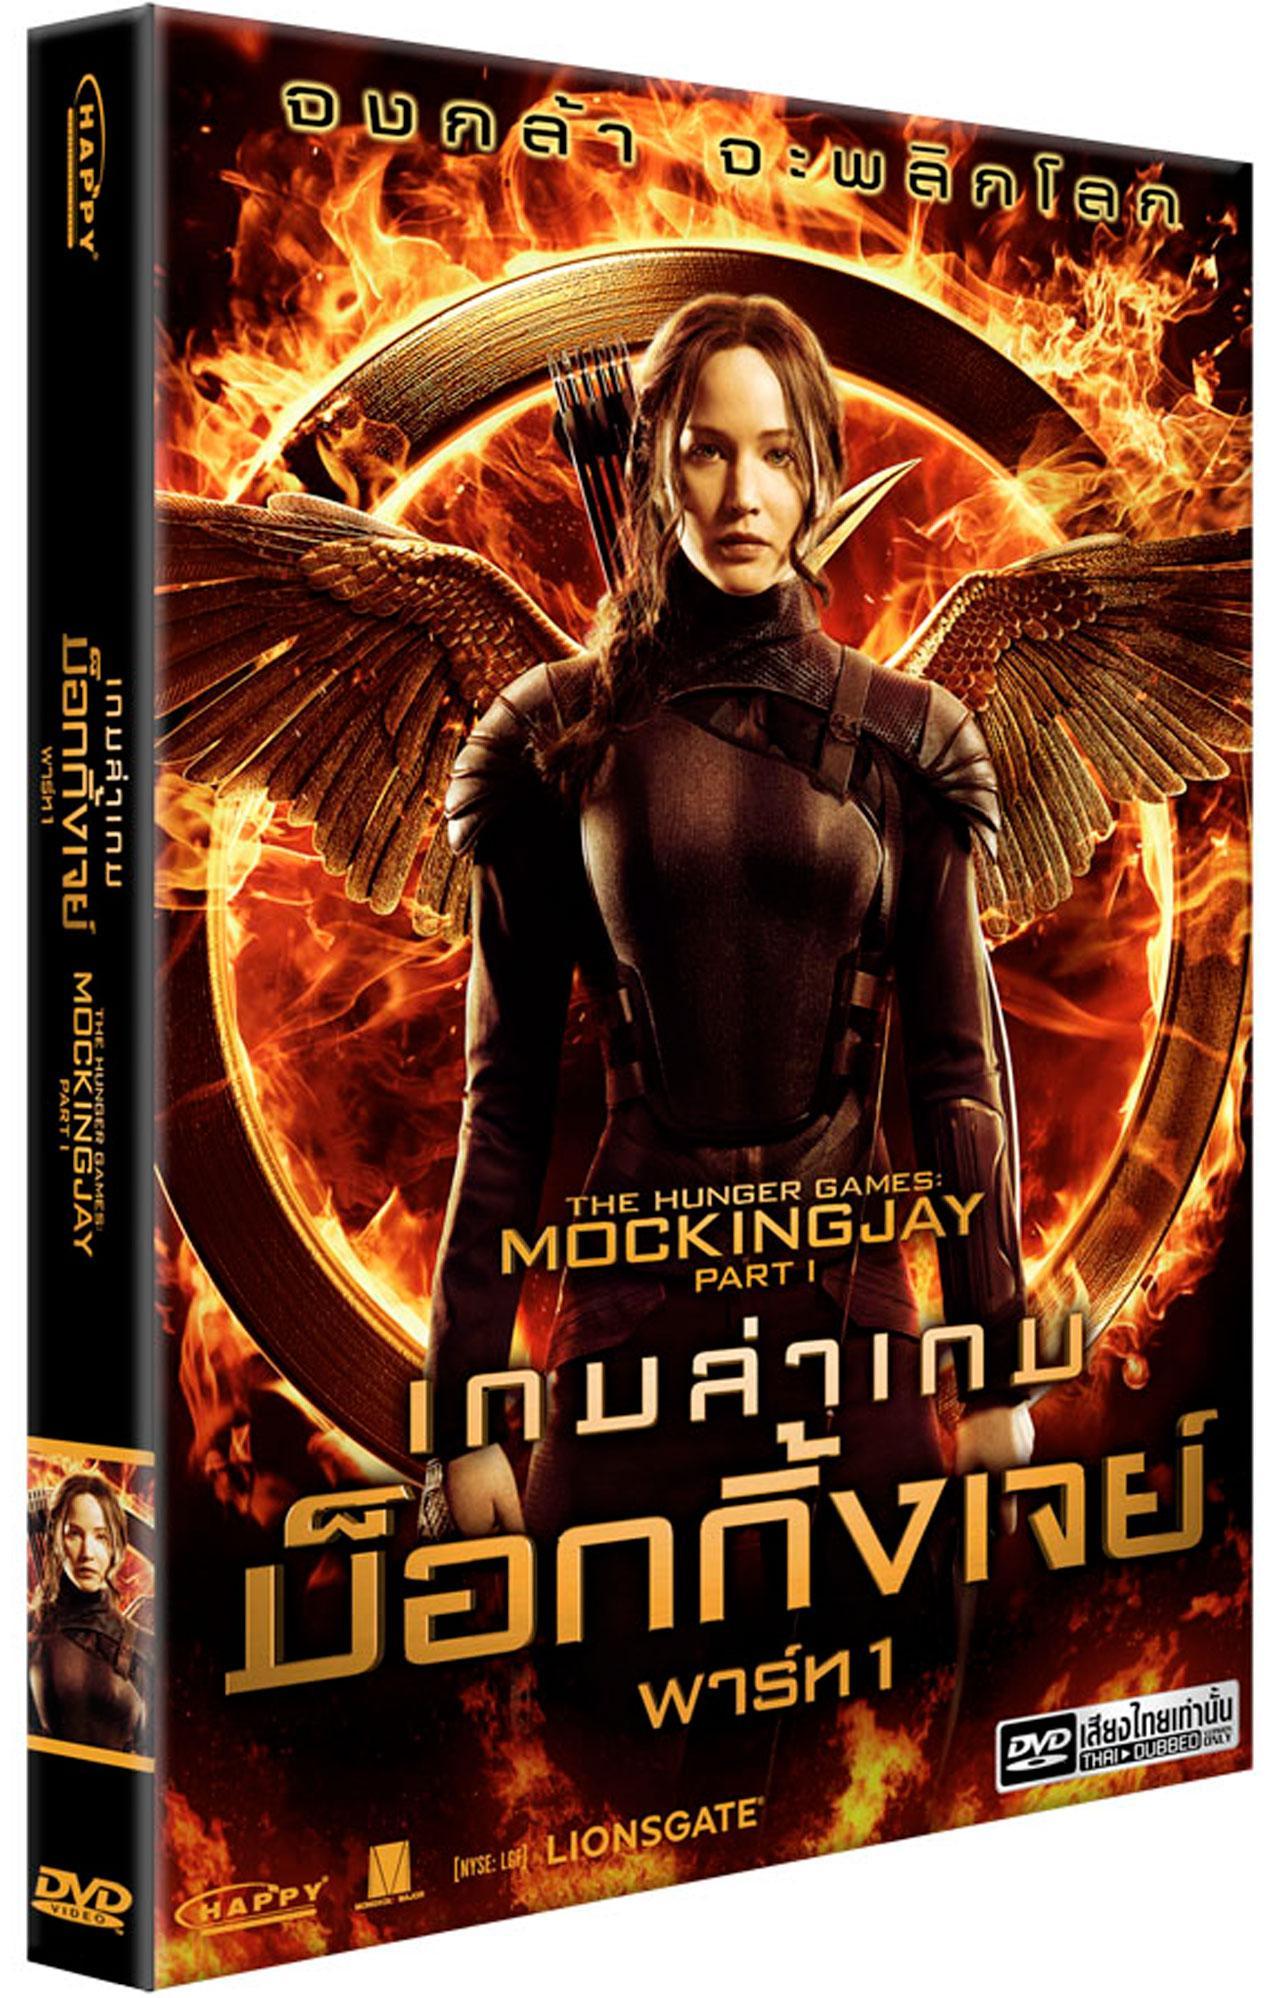 The Hunger Games Mocking Jay Part 1 : เกมล่าเกมม็อกกิ้งเจย์ พาร์ท1